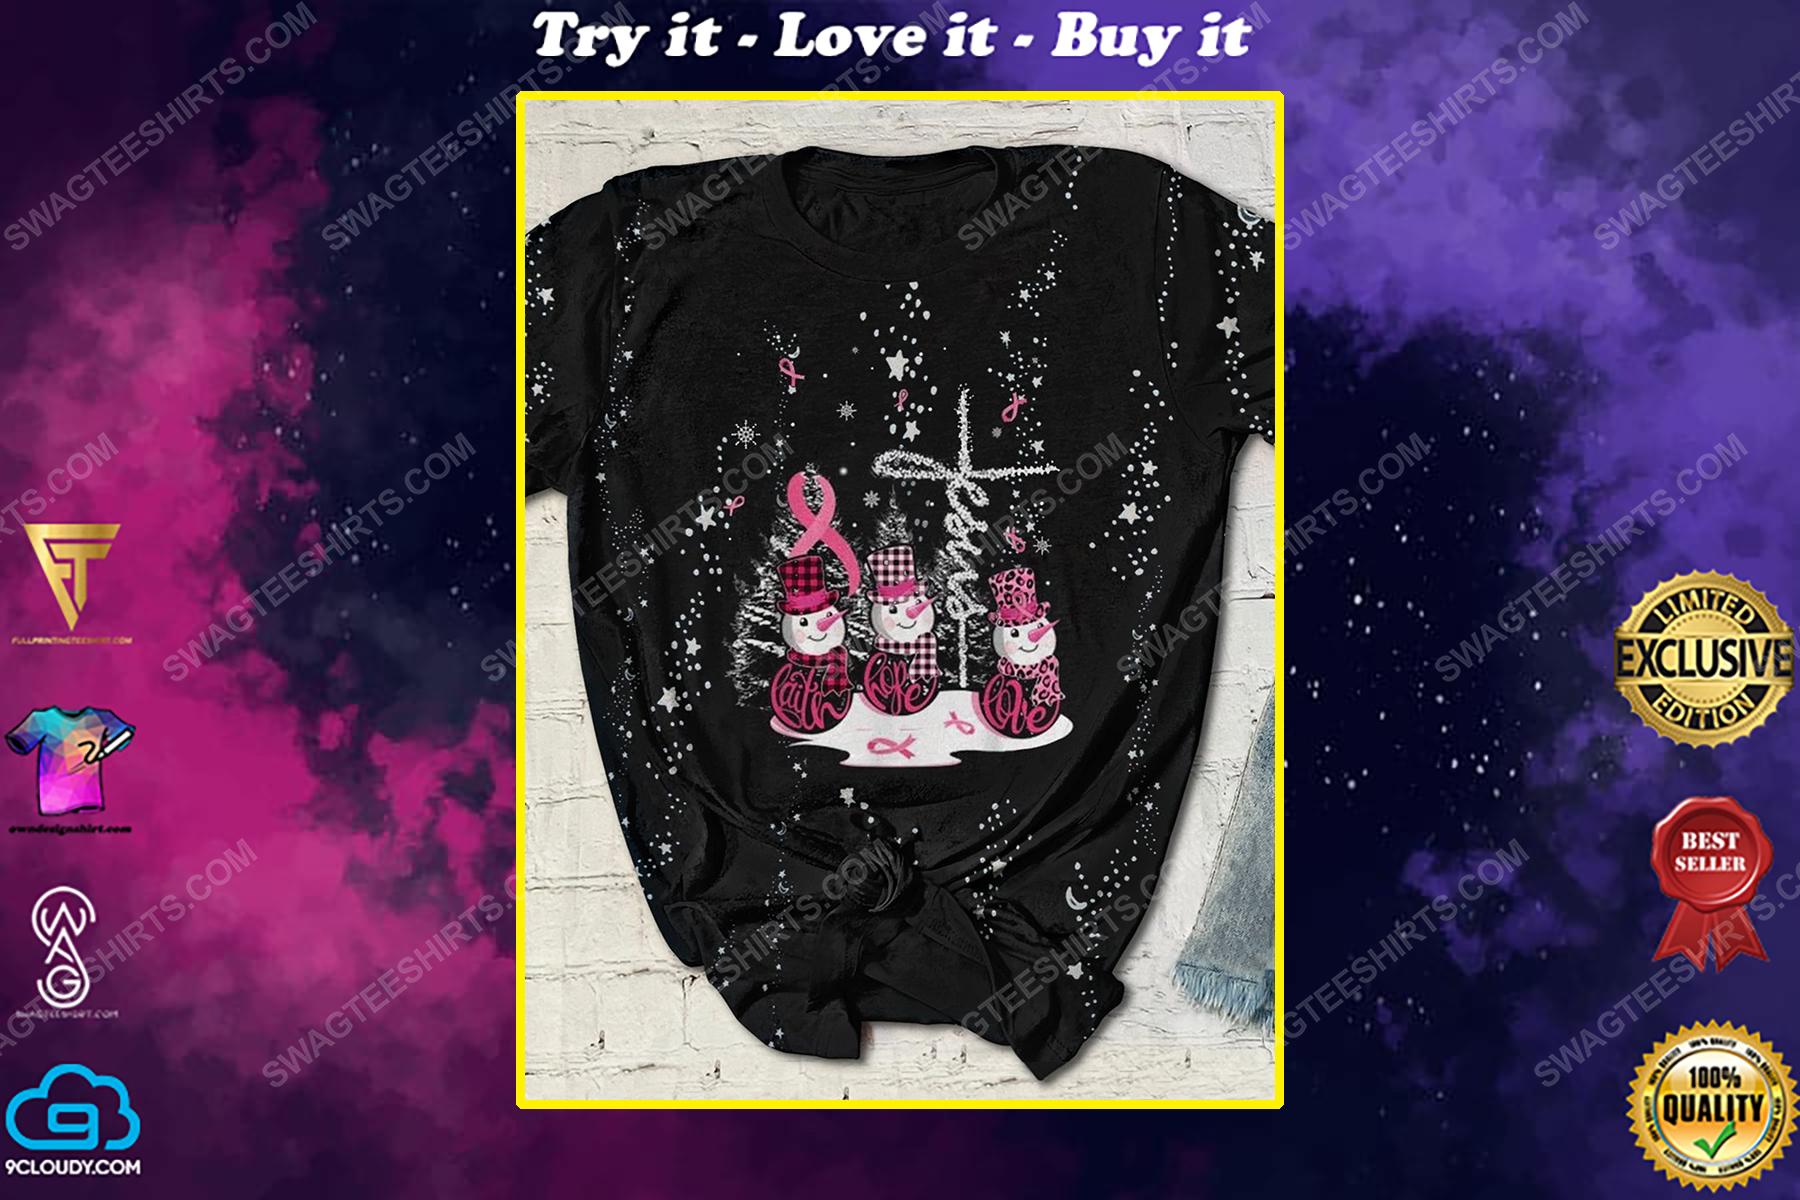 Christmas Jesus breast cancer awareness full print shirt